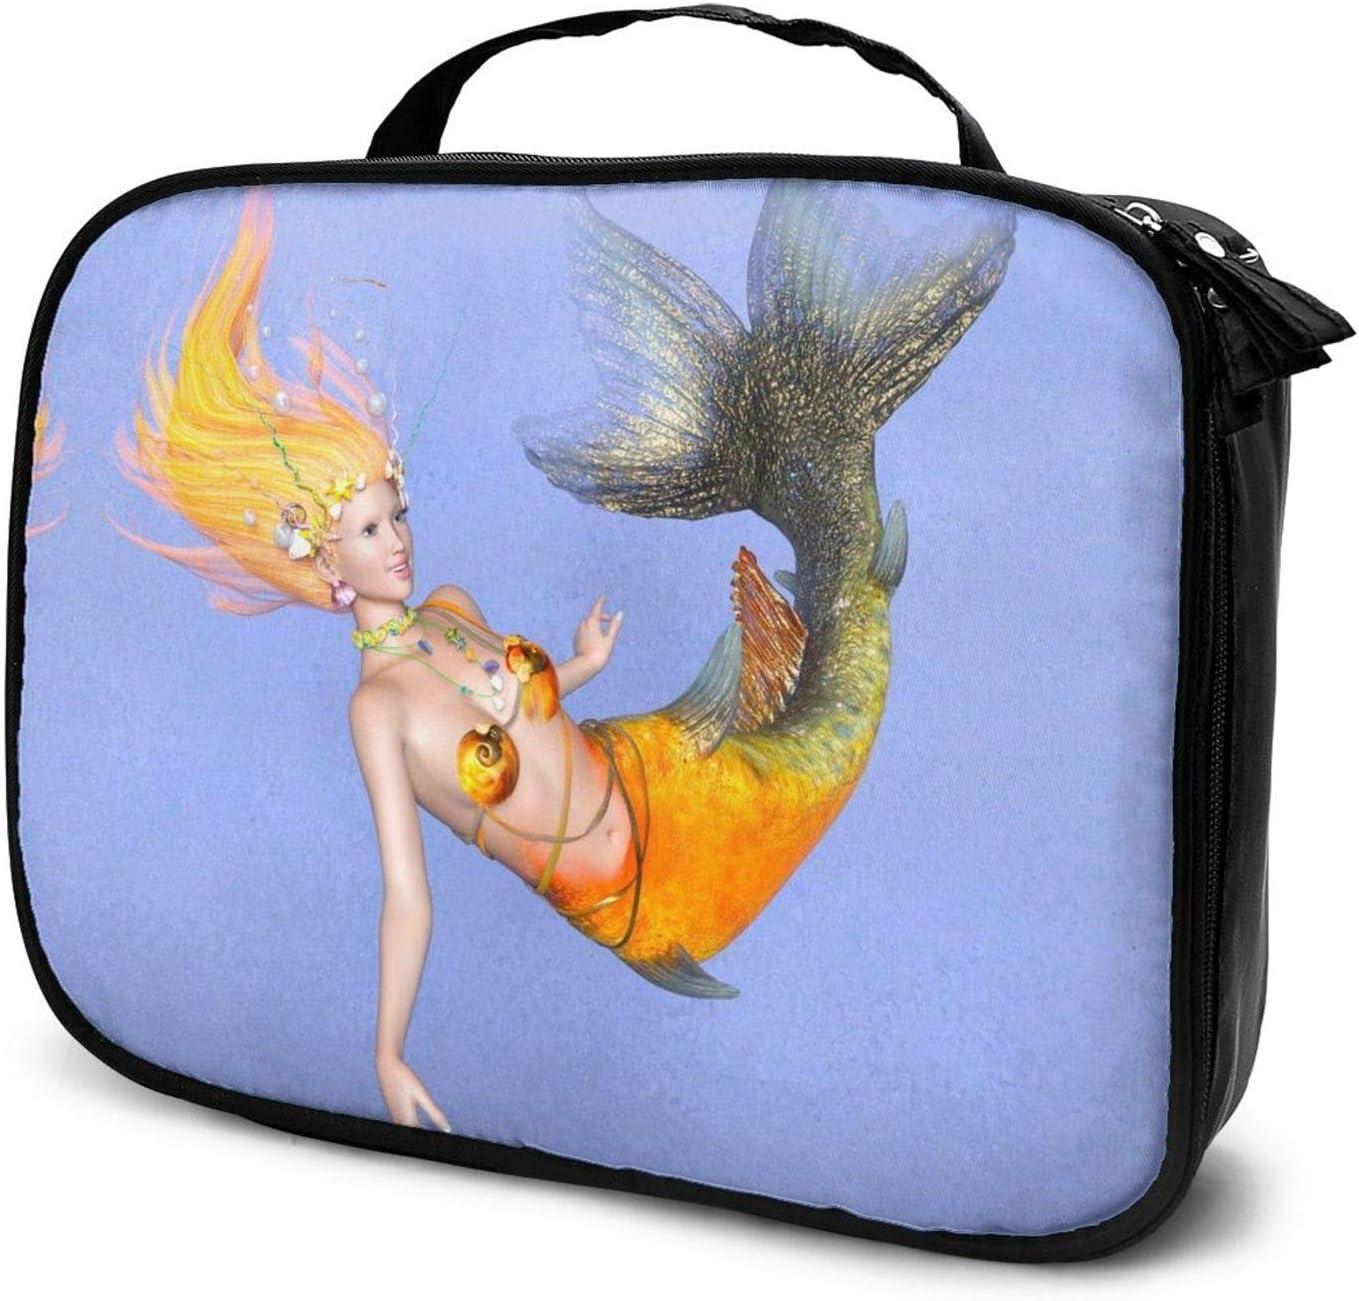 San Francisco Mall Beautiful Mermaid Travel Makeup 55% OFF Cosmetic Case Train